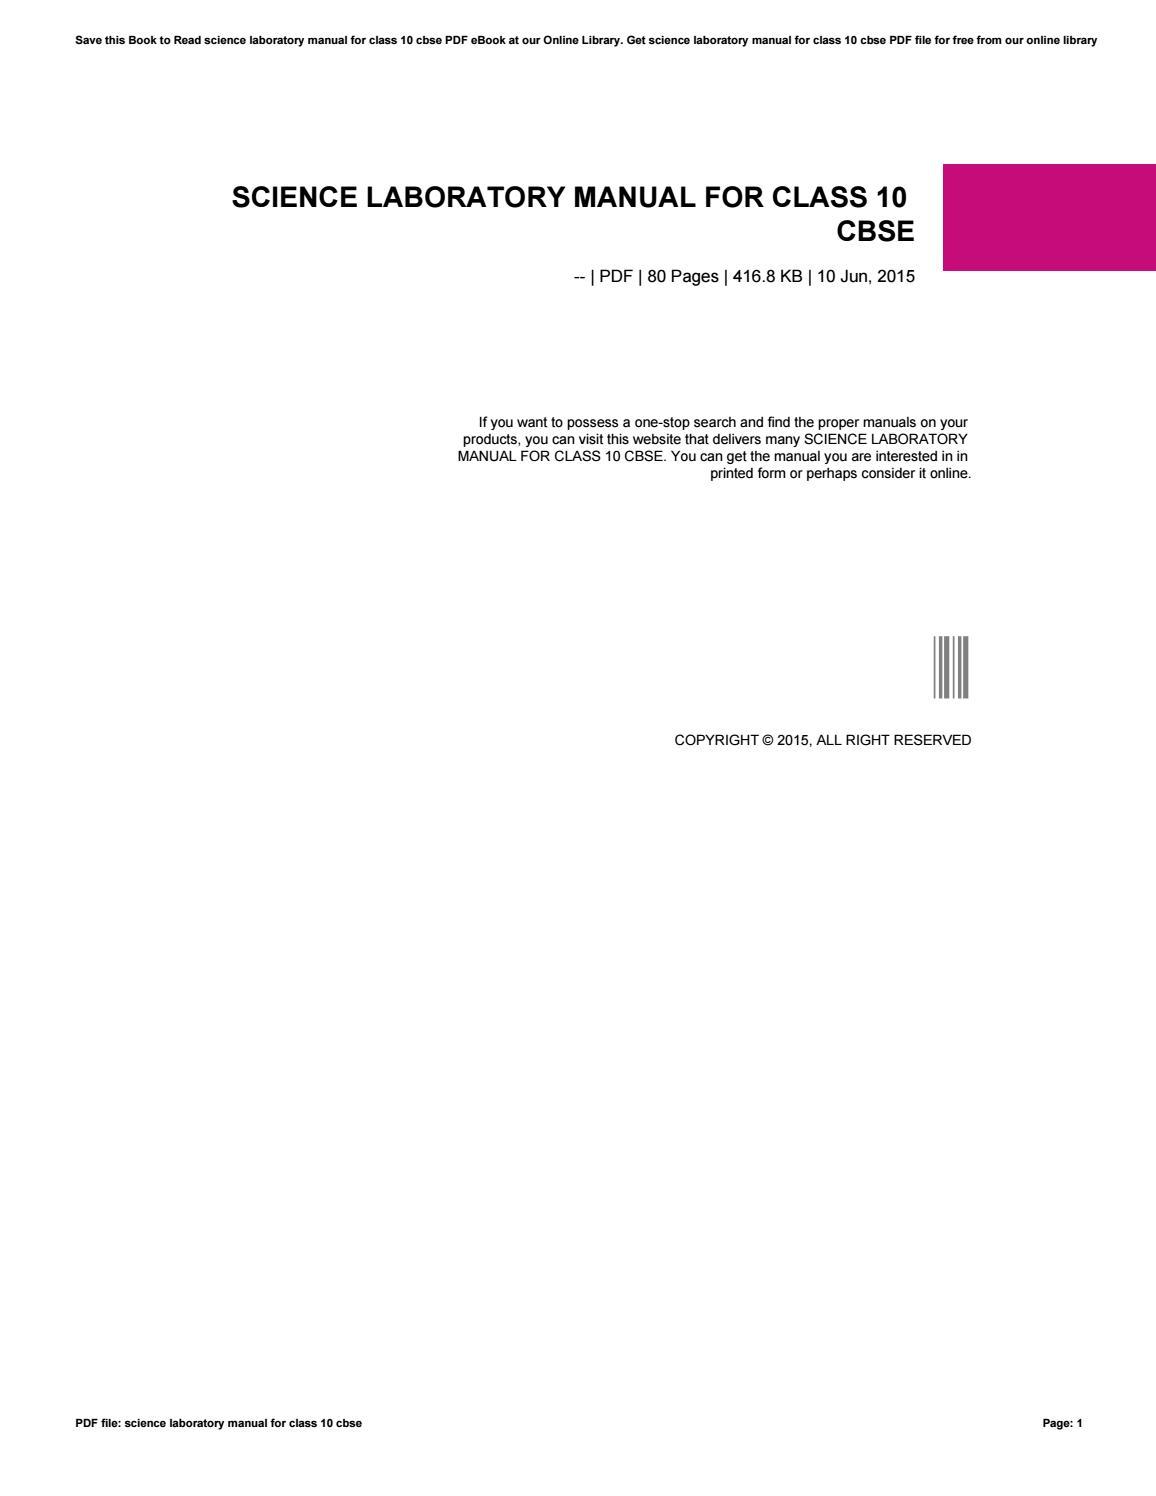 Science Lab manual Cbse